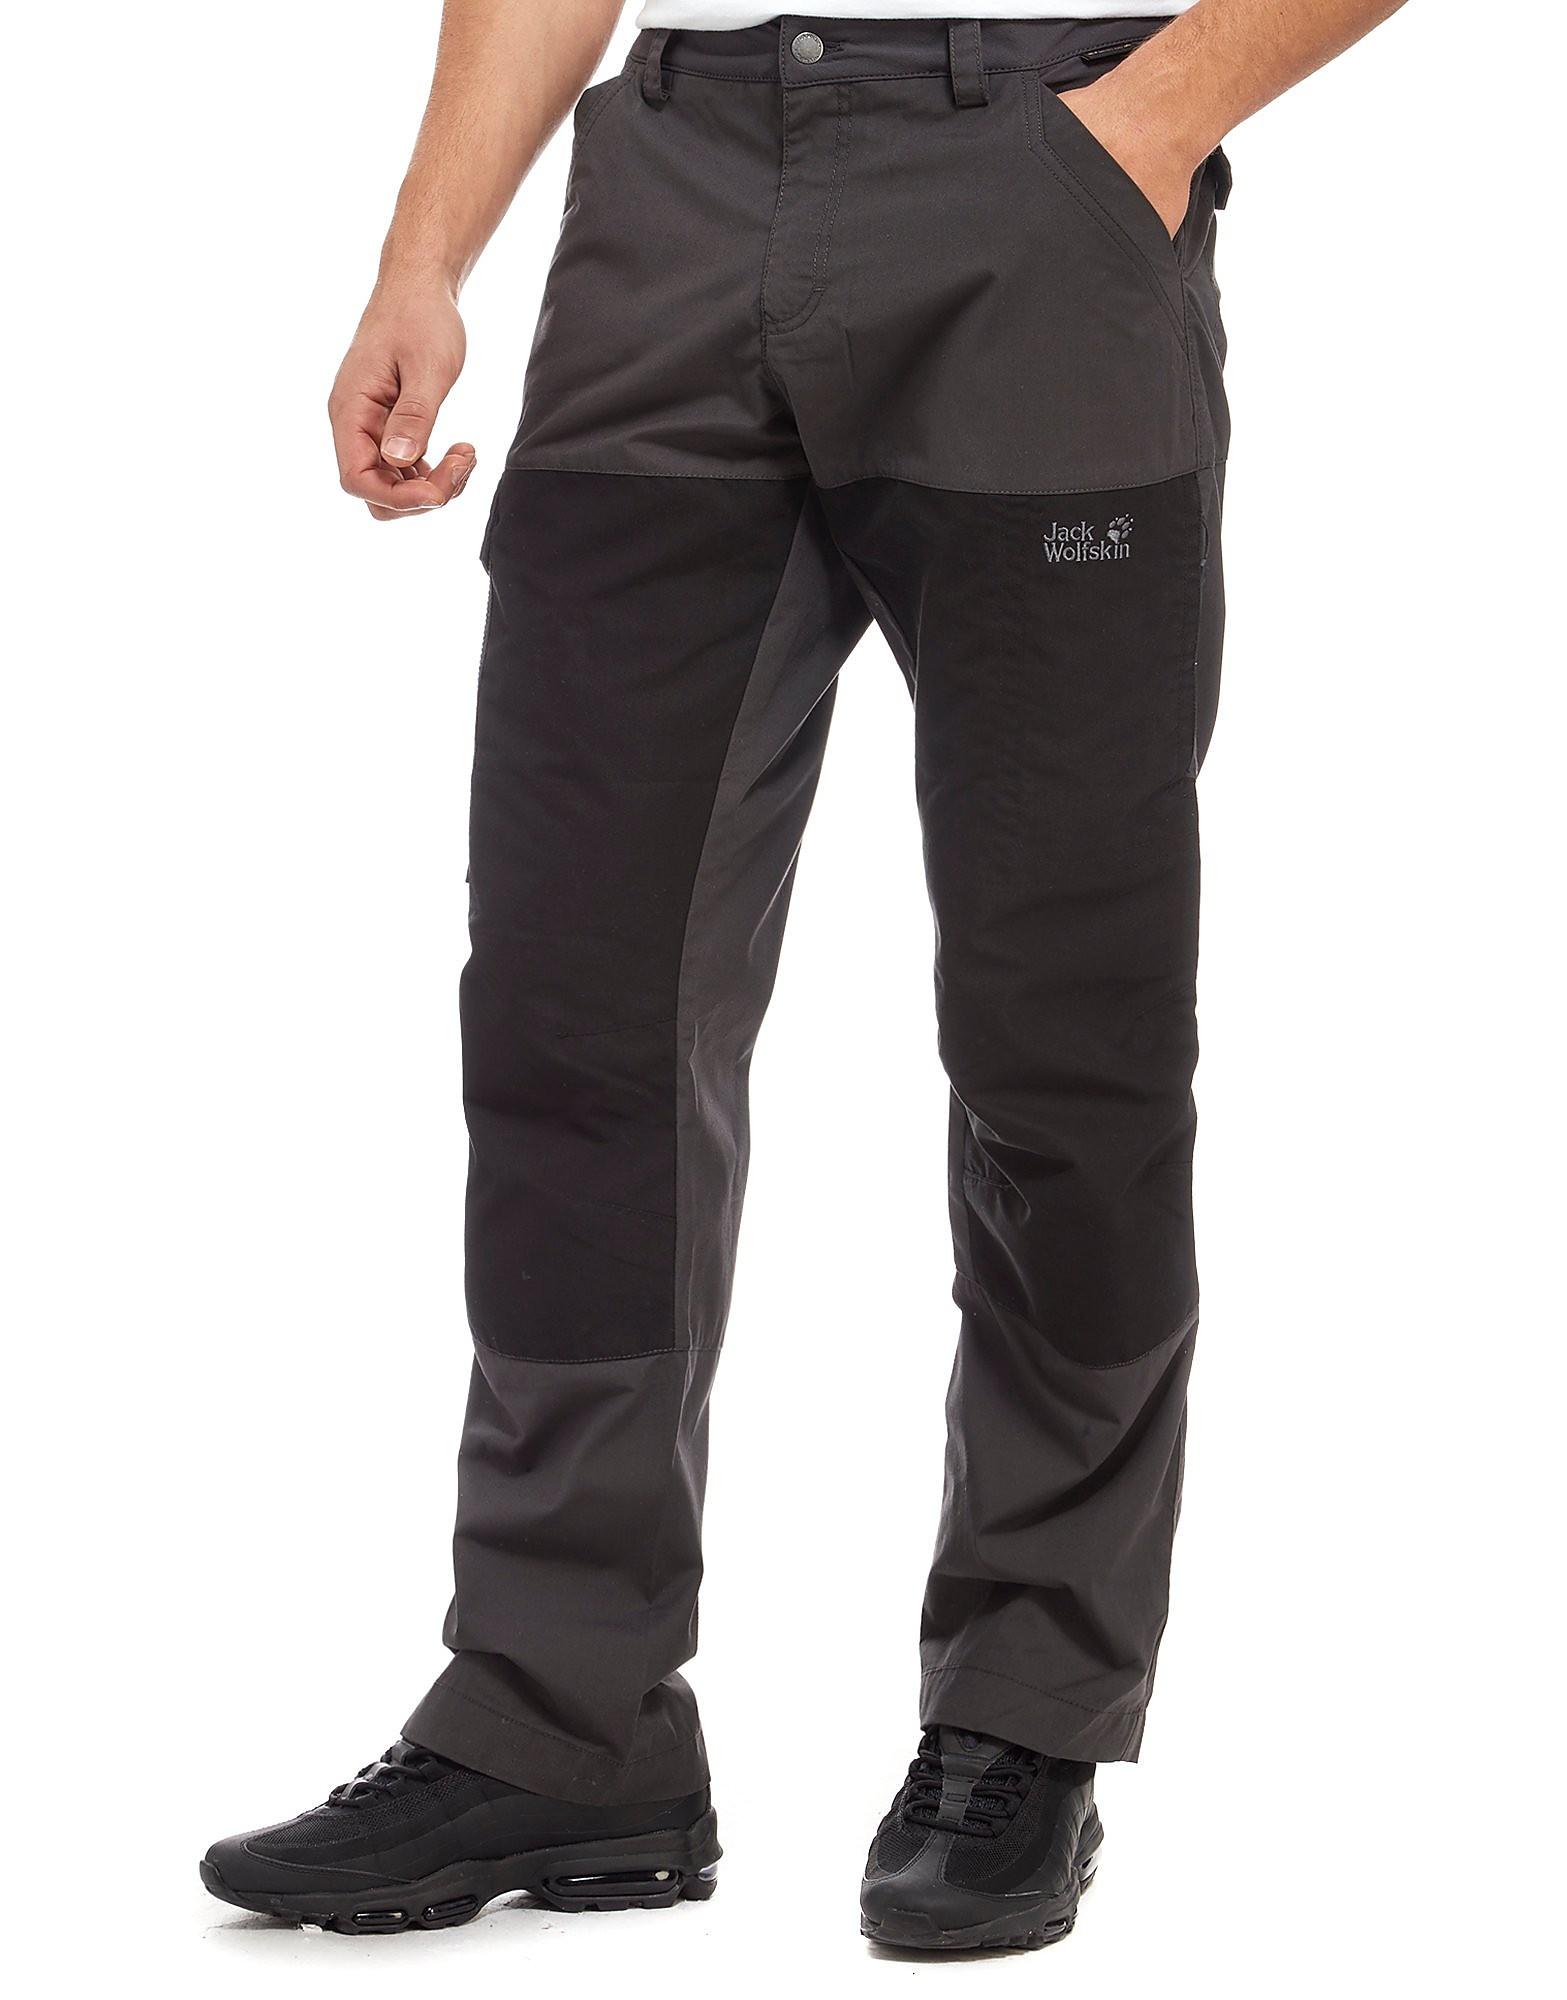 Jack Wolfskin Flex Panel Woven Pants